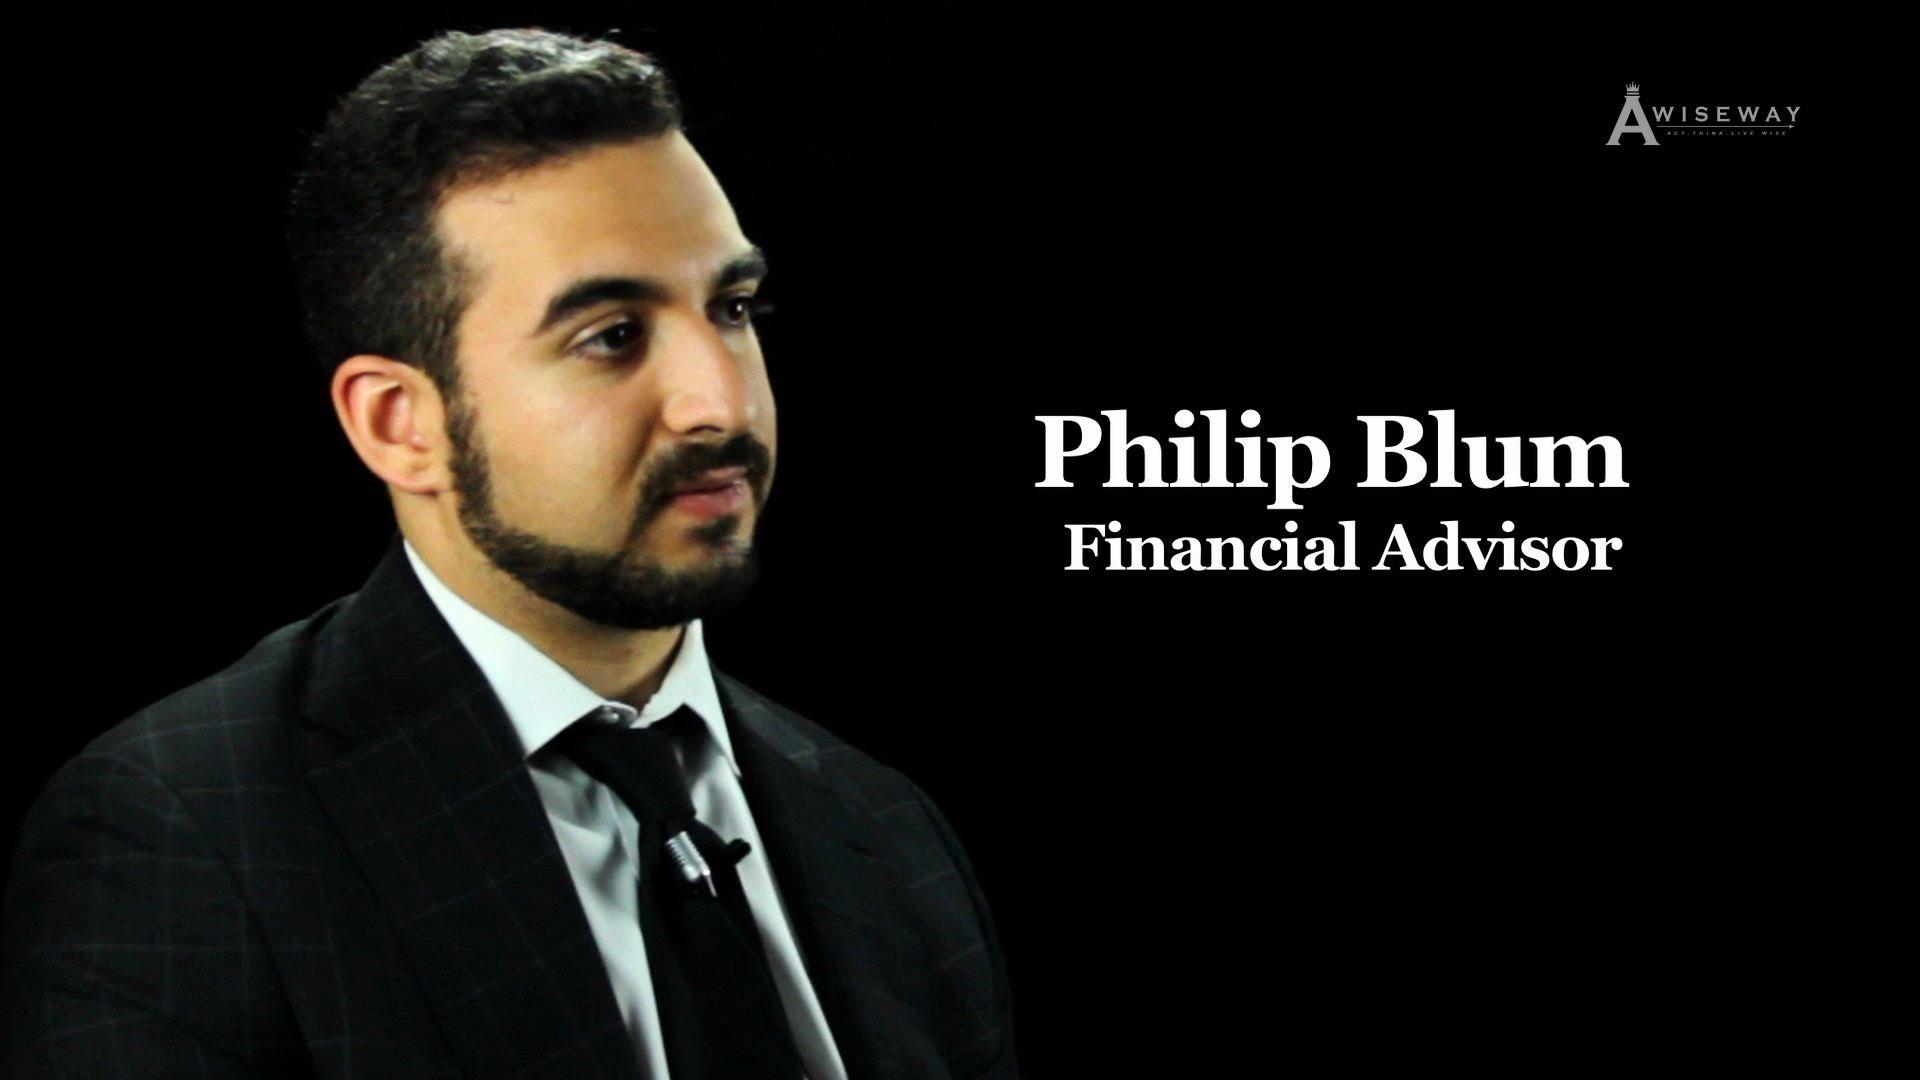 Why Should I Seek Out a Financial Advisor?